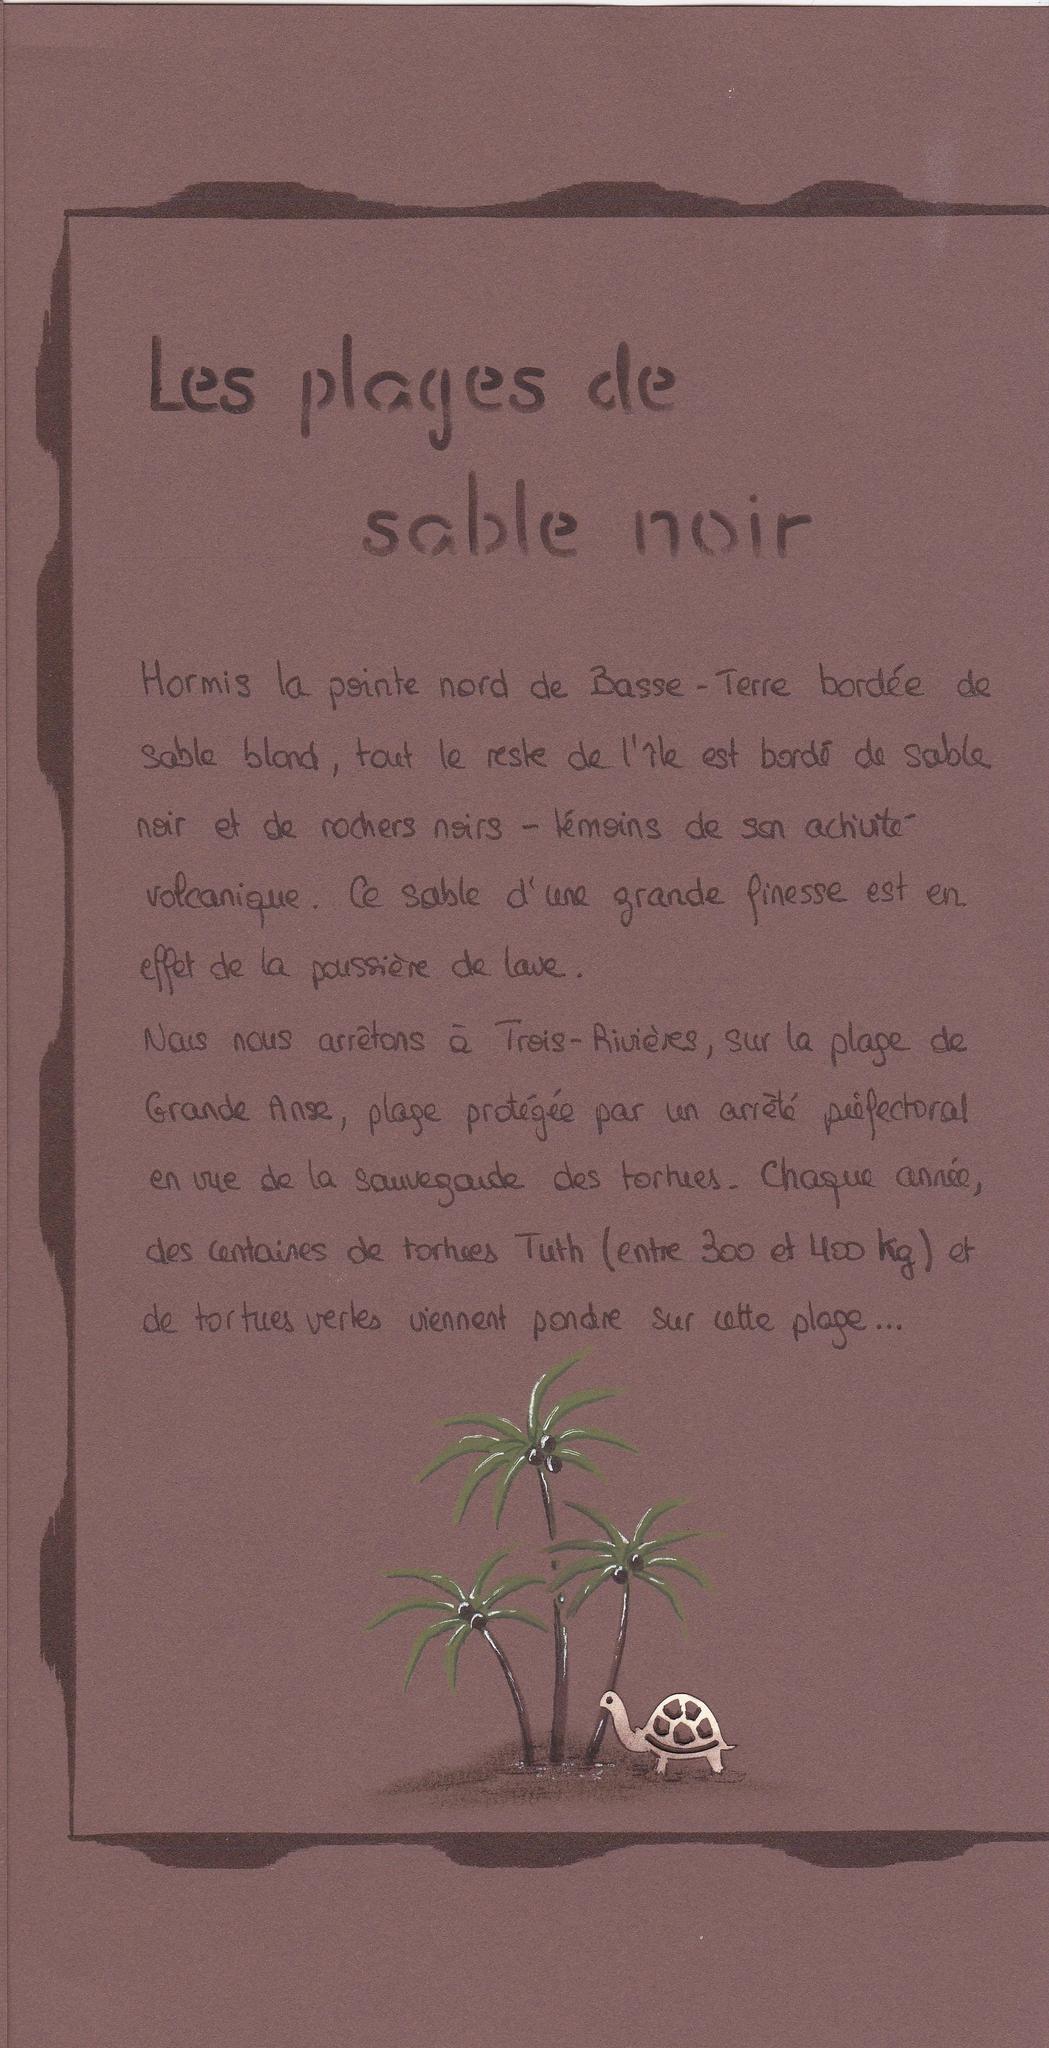 guadeloupe-page66a